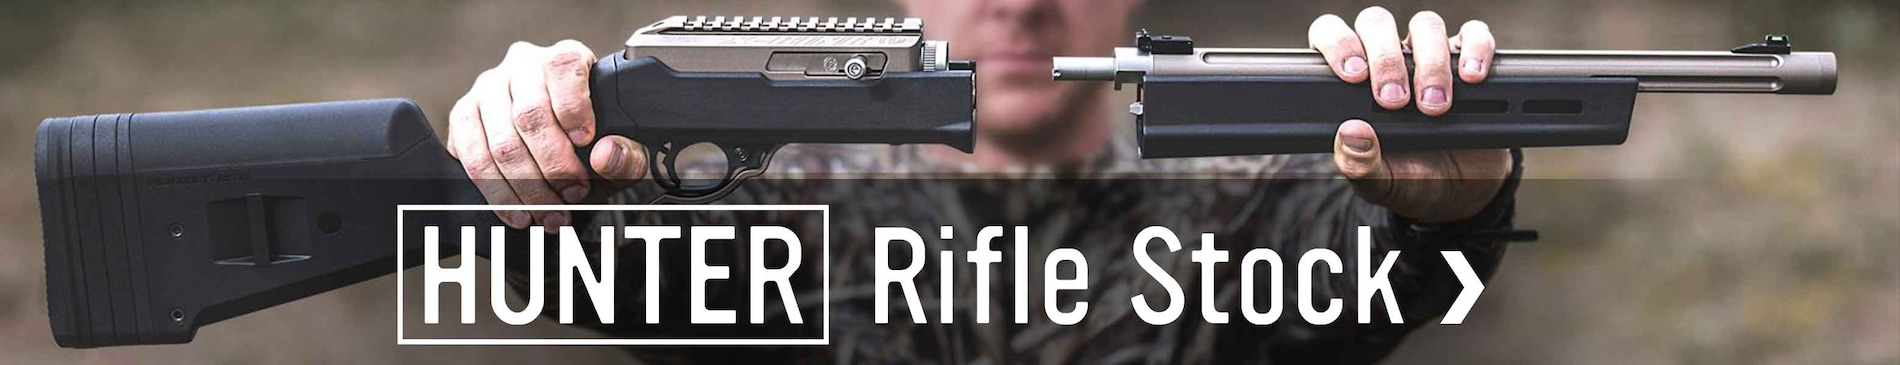 Magpul Hunter Rifle Stock